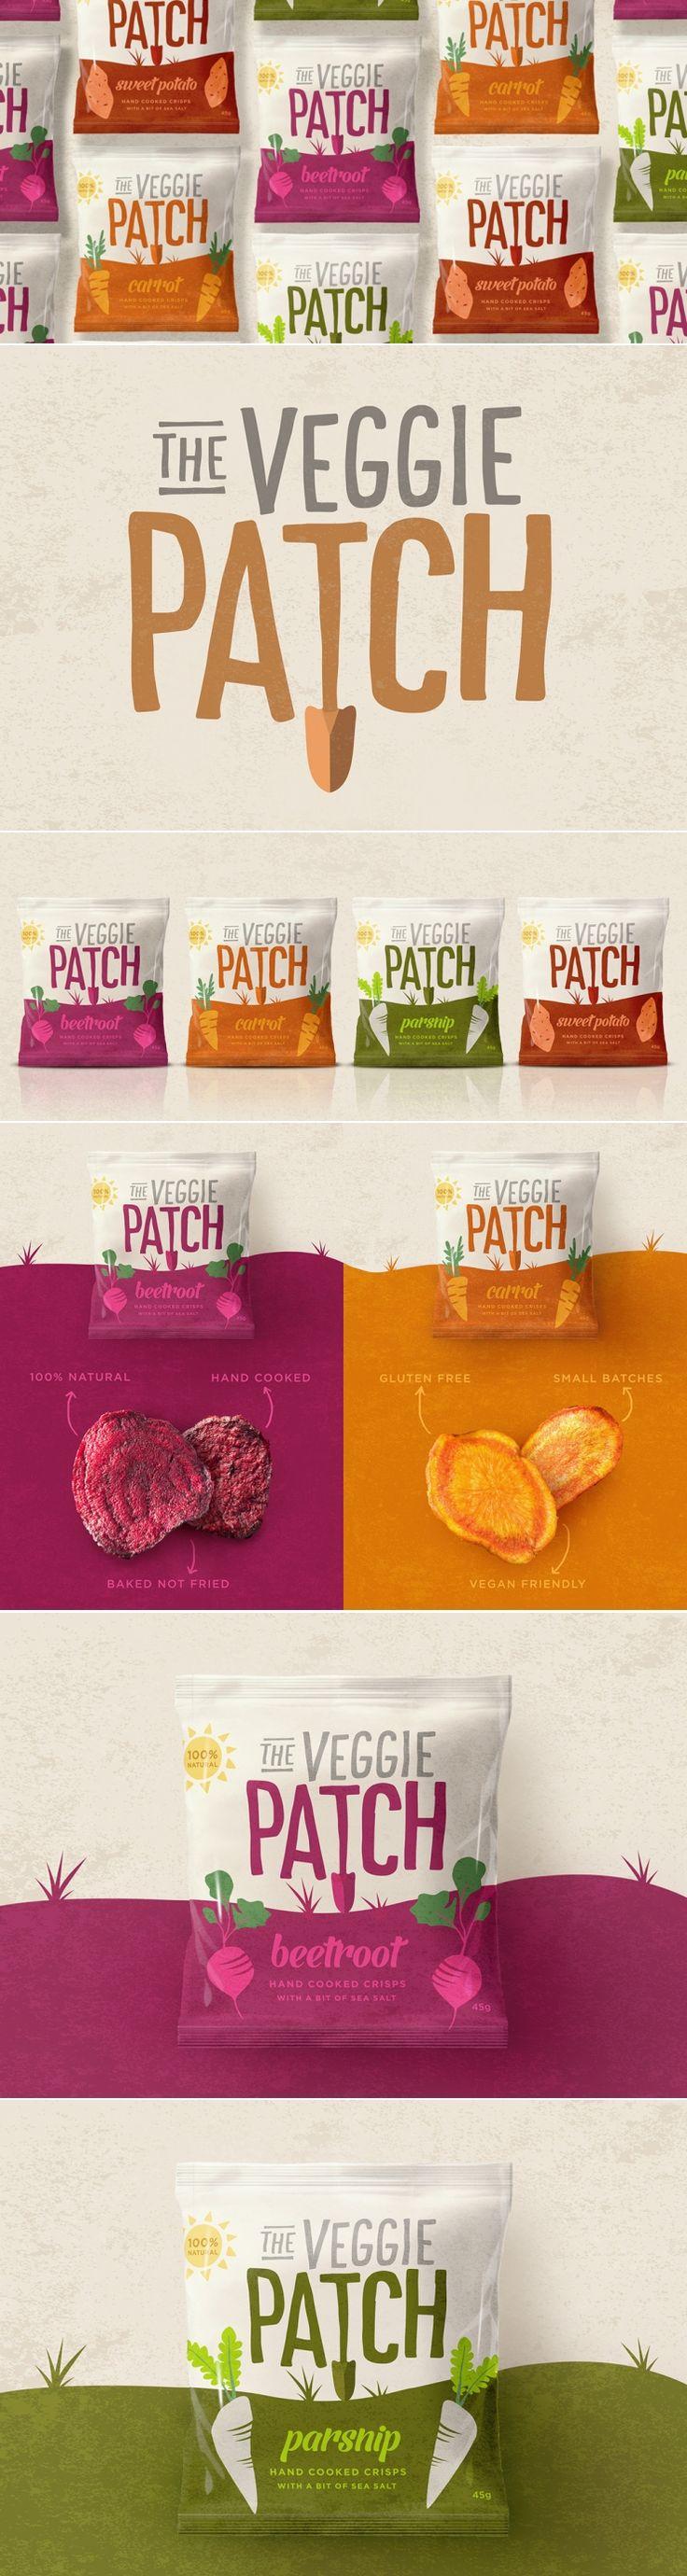 The Veggie Patch — The Dieline | Packaging & Branding Design & Innovation News